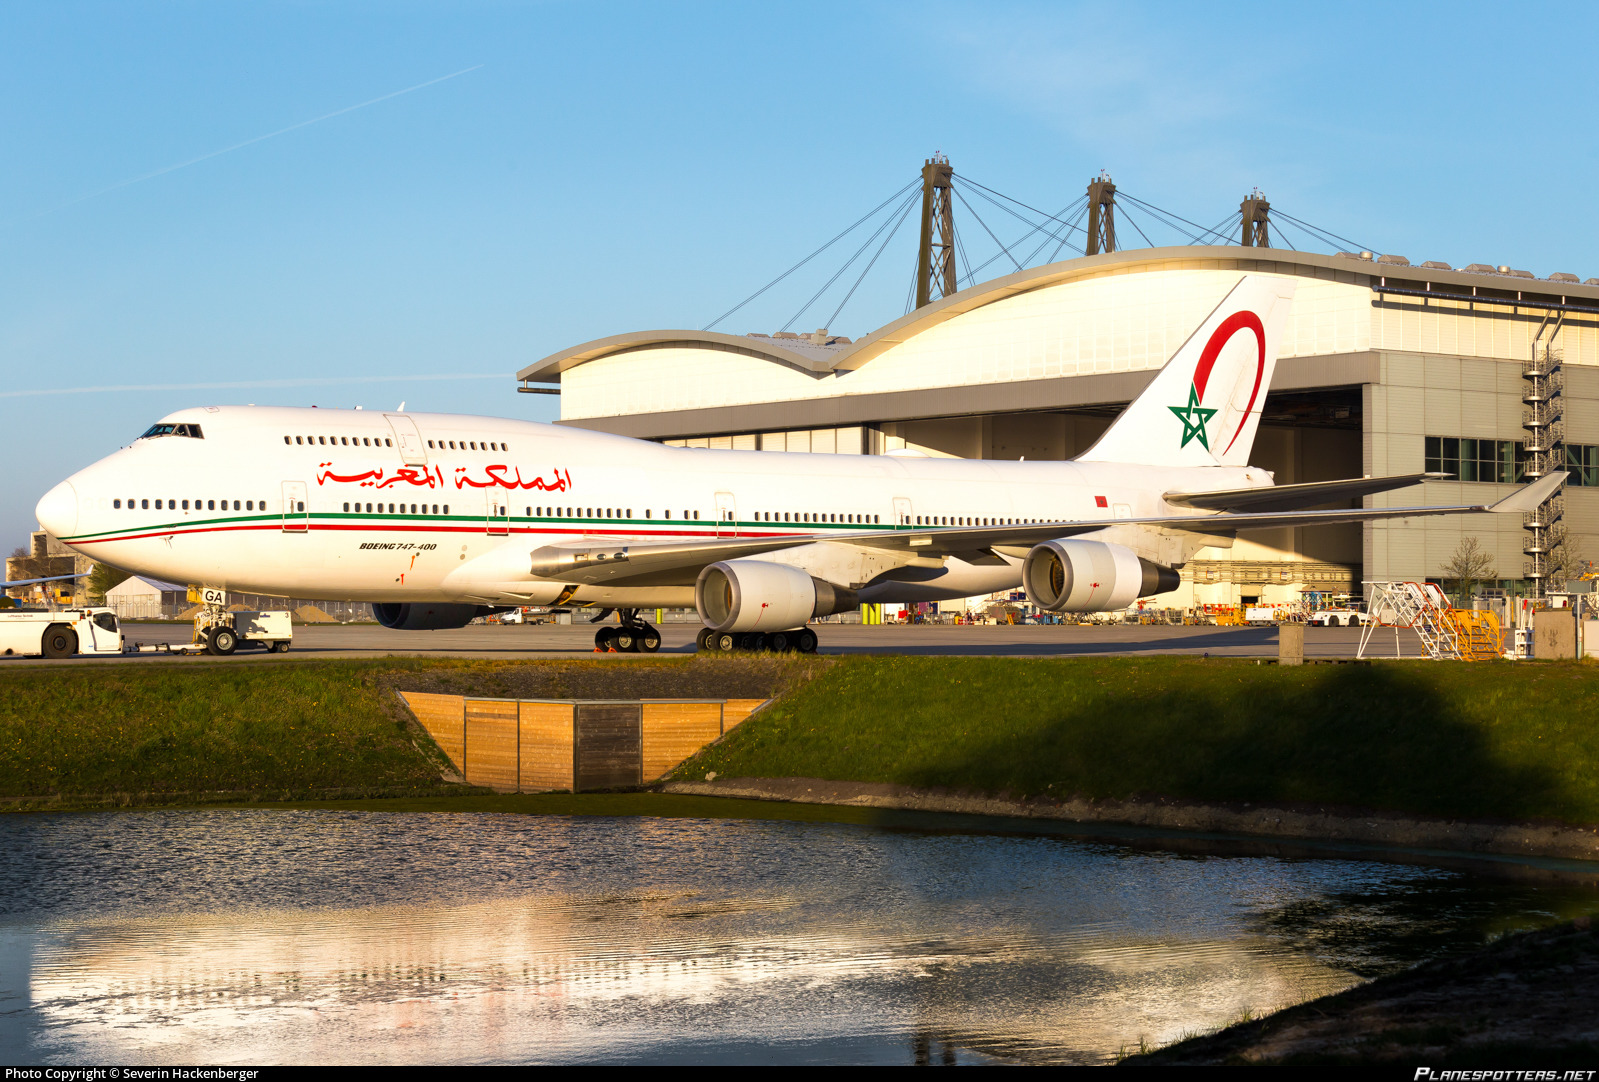 FRA: Avions VIP, Liaison & ECM - Page 24 Cn-rga-morocco-government-boeing-747-428_PlanespottersNet_1067864_8cfe2795b0_o